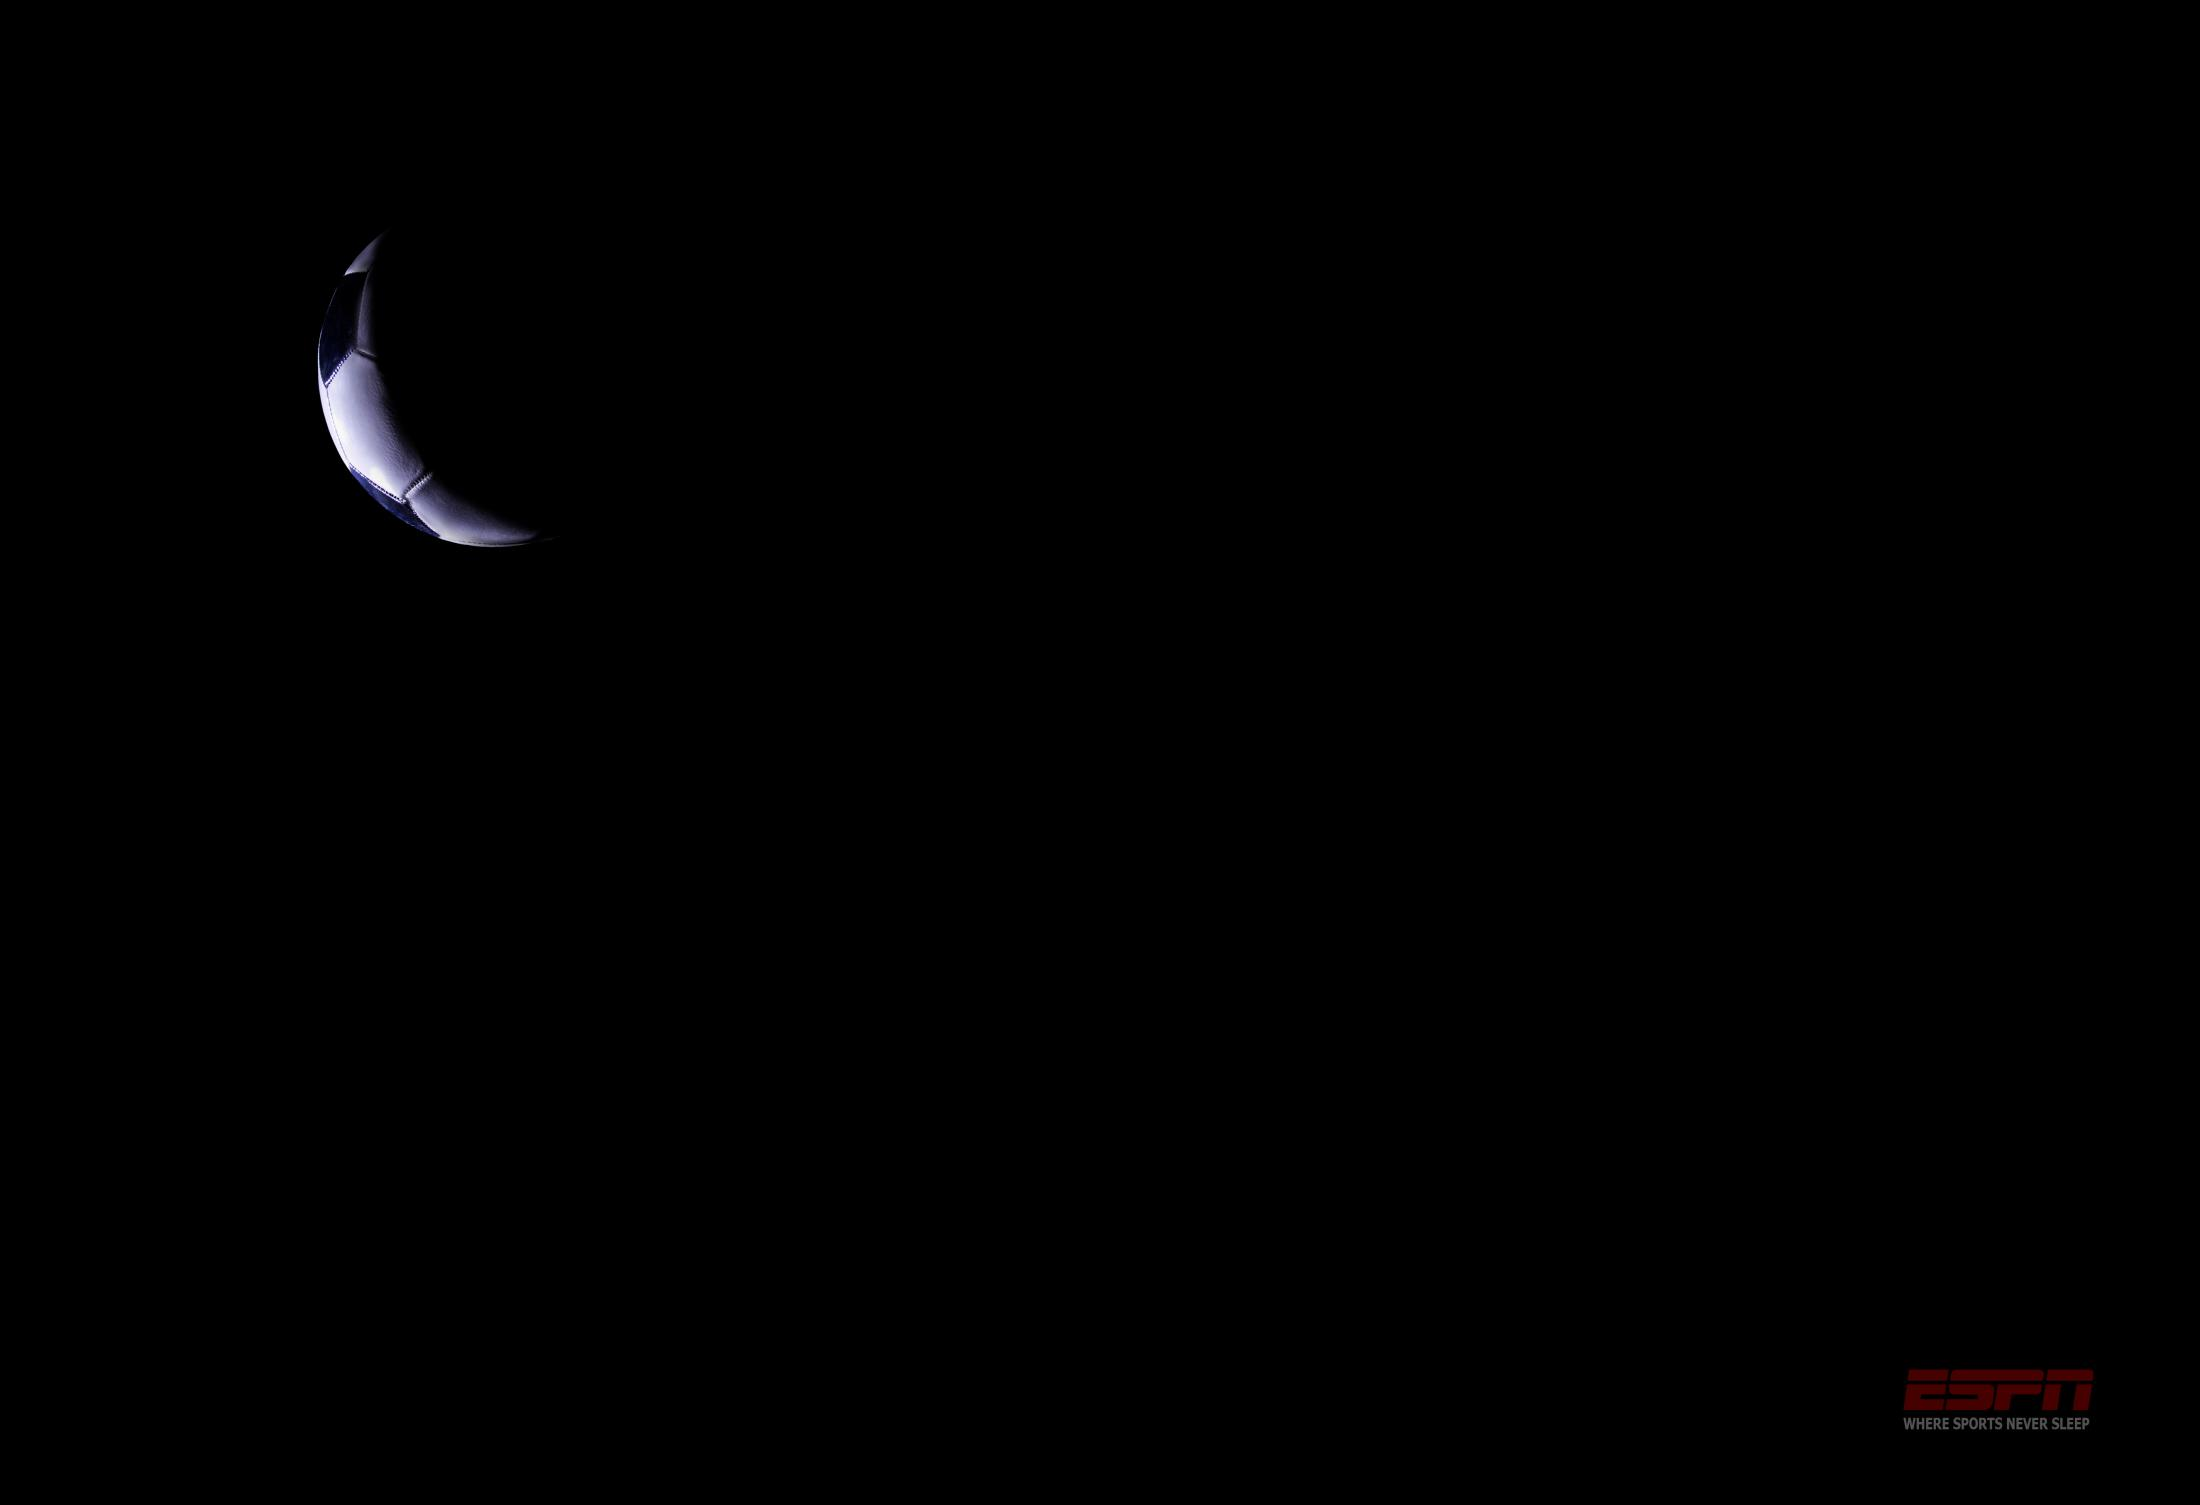 Thumbnail for Moons